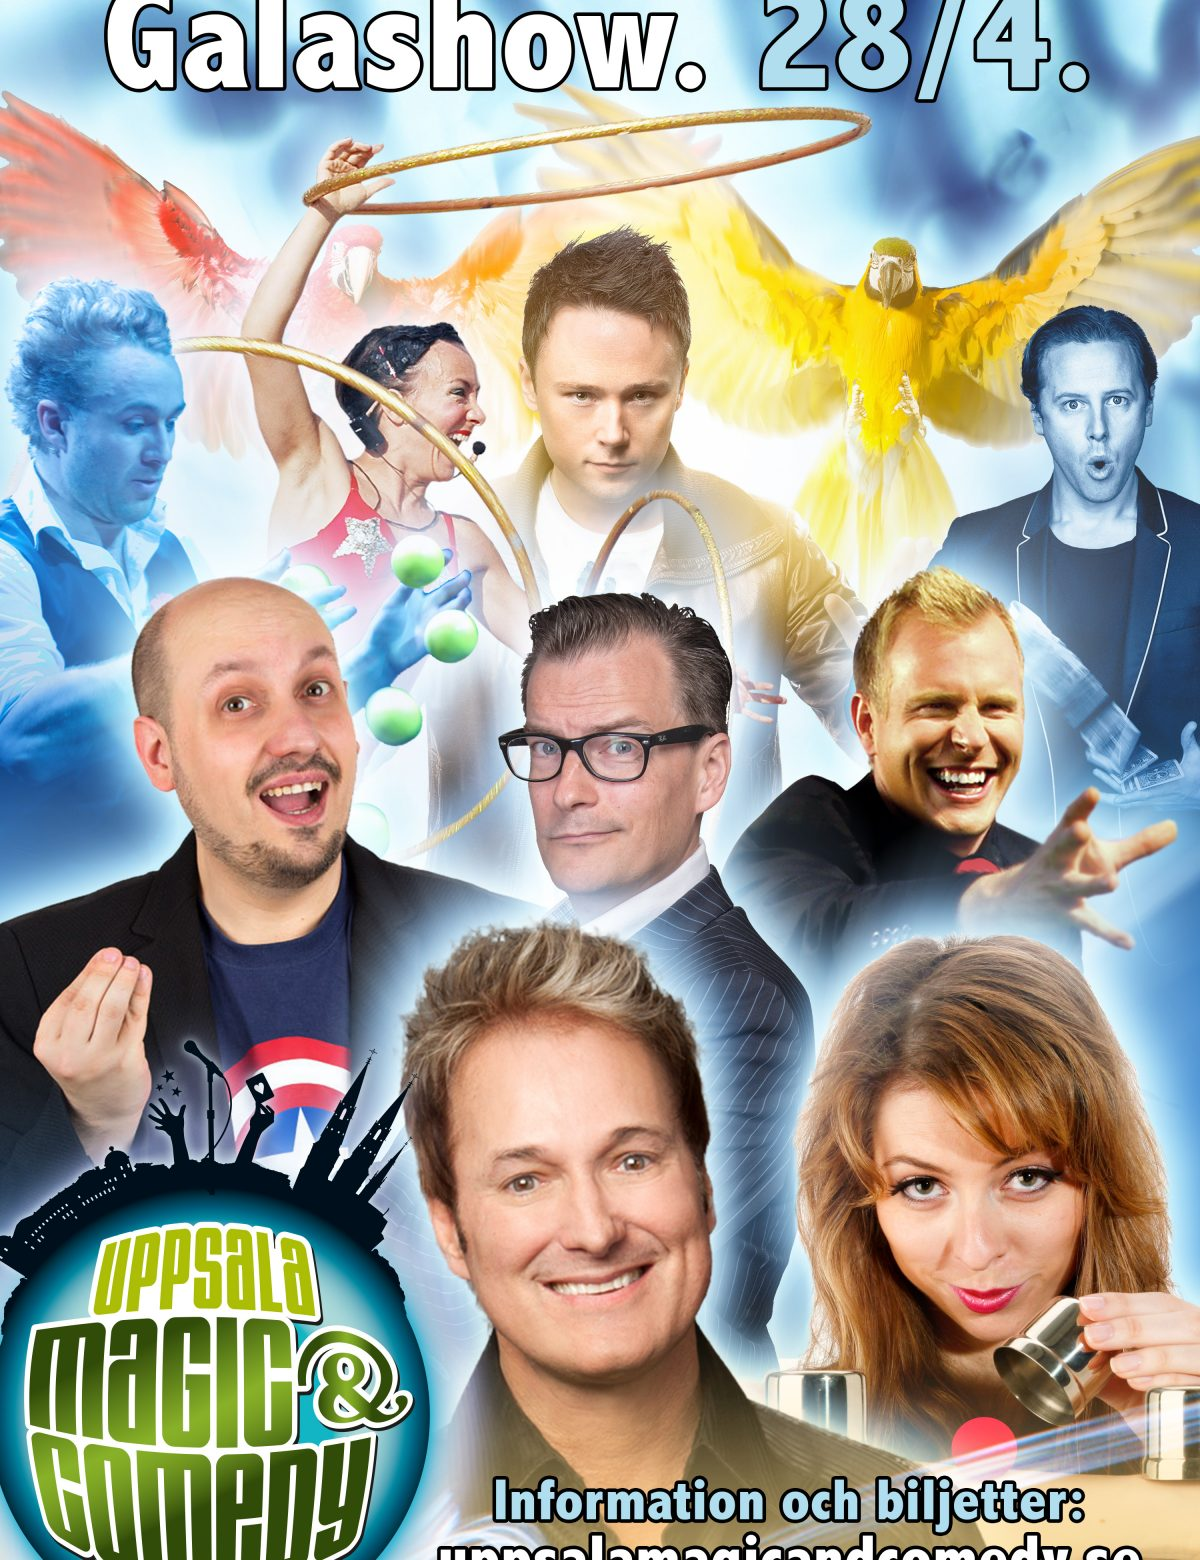 Galashow, Uppsala Magic & Comedy